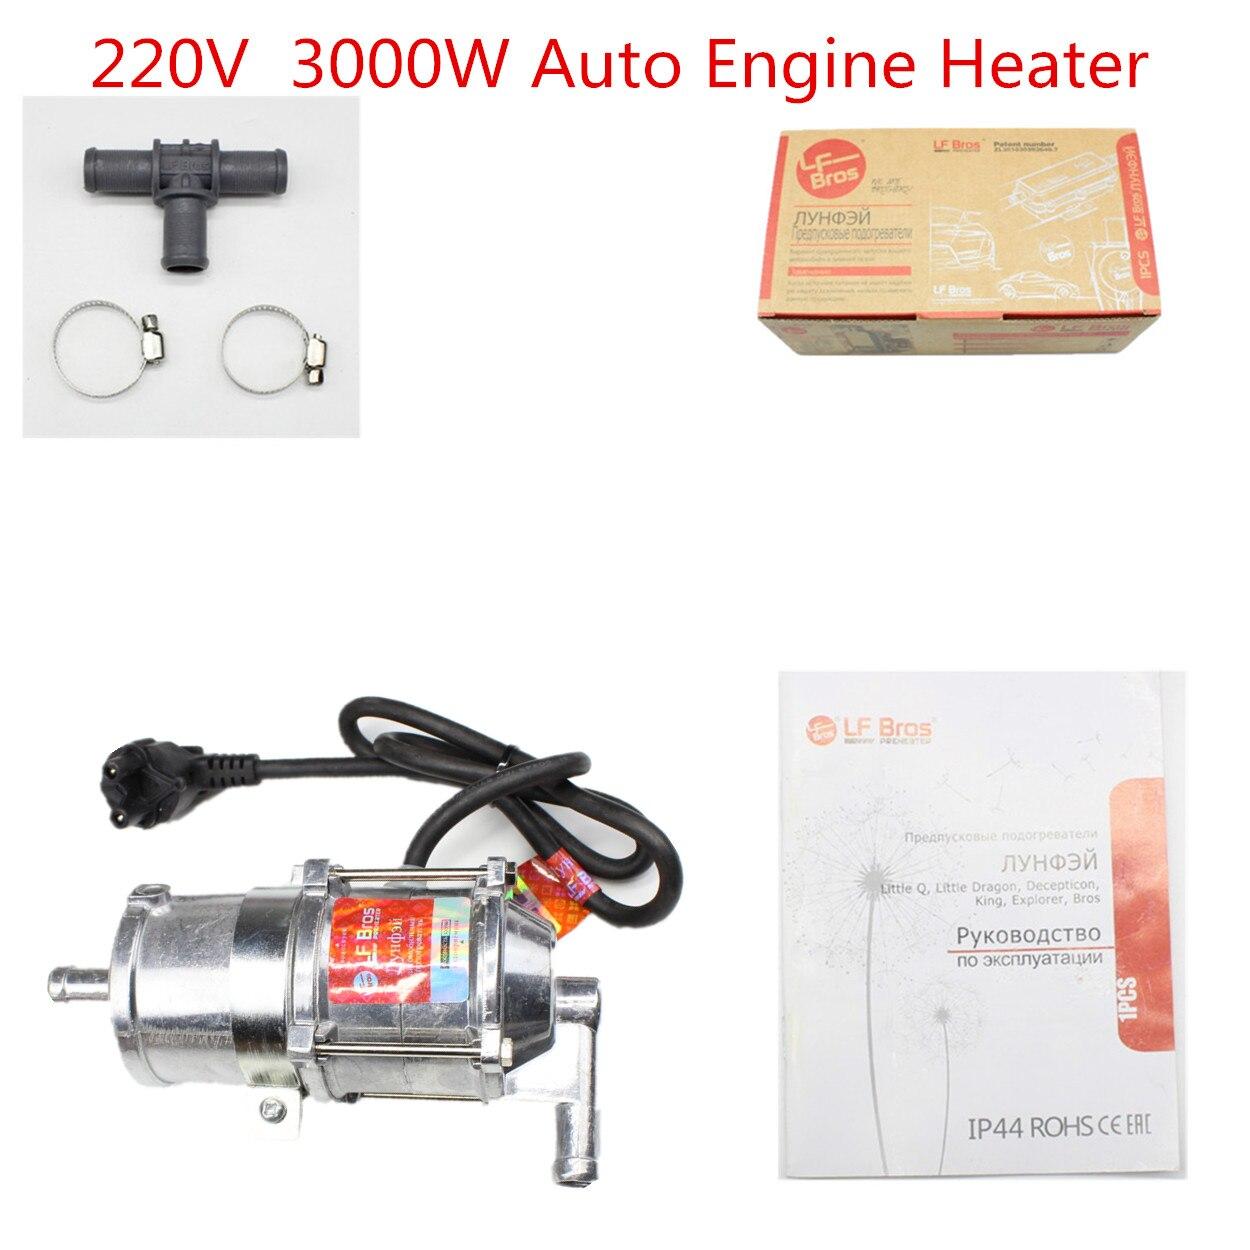 220V 3000W Auto Engine…